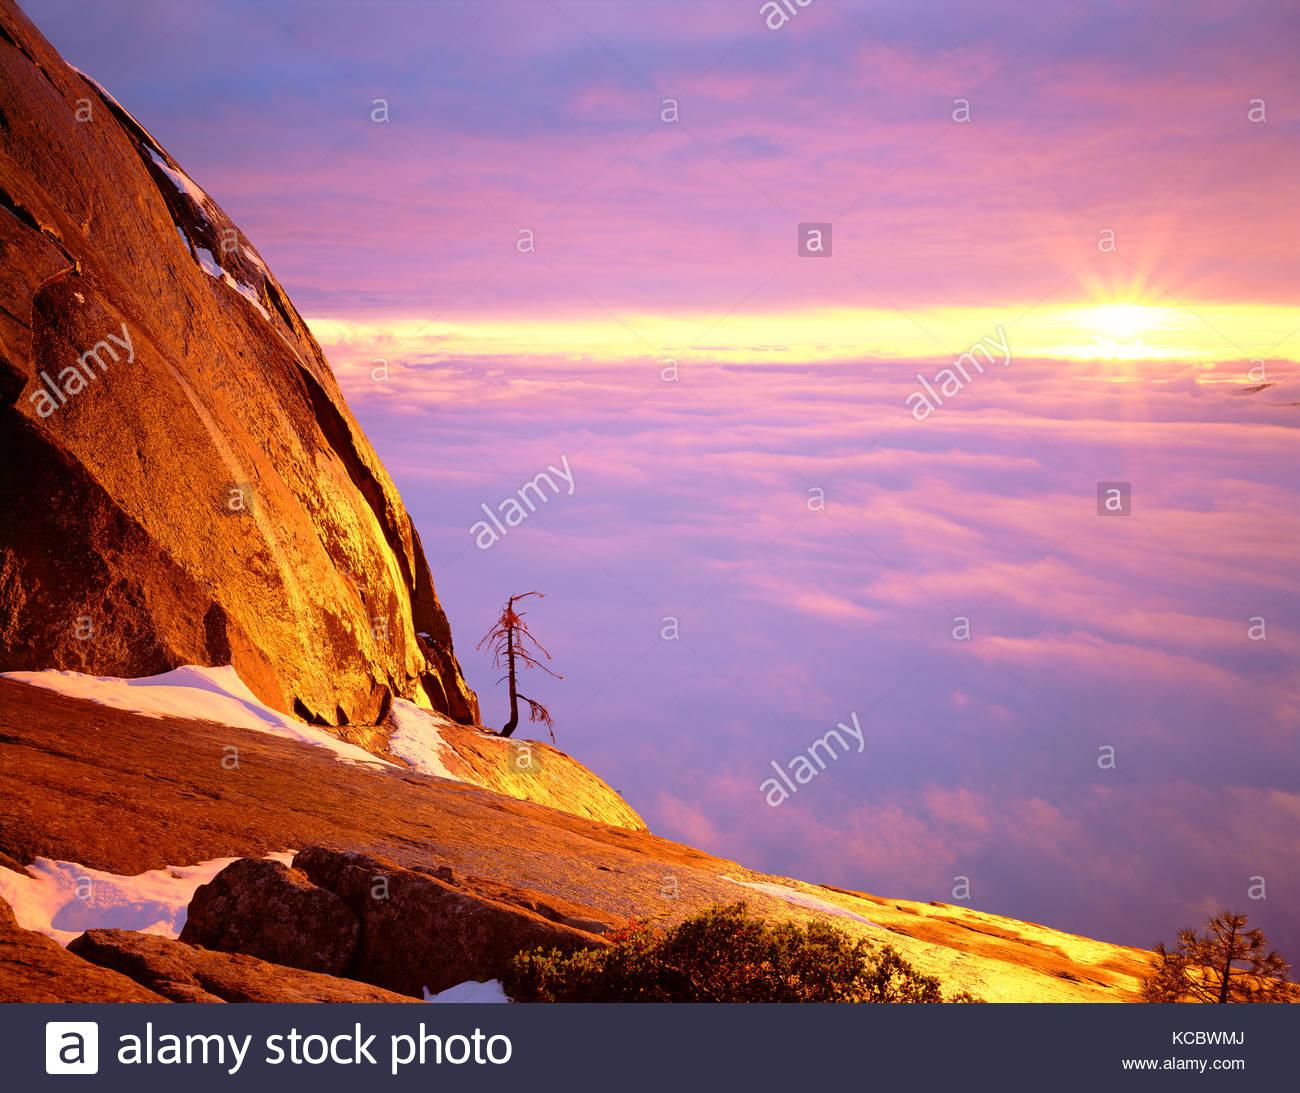 Clearing Sturm bei Sonnenuntergang von Moro Rock, Sequoia National Park, Kalifornien Stockbild